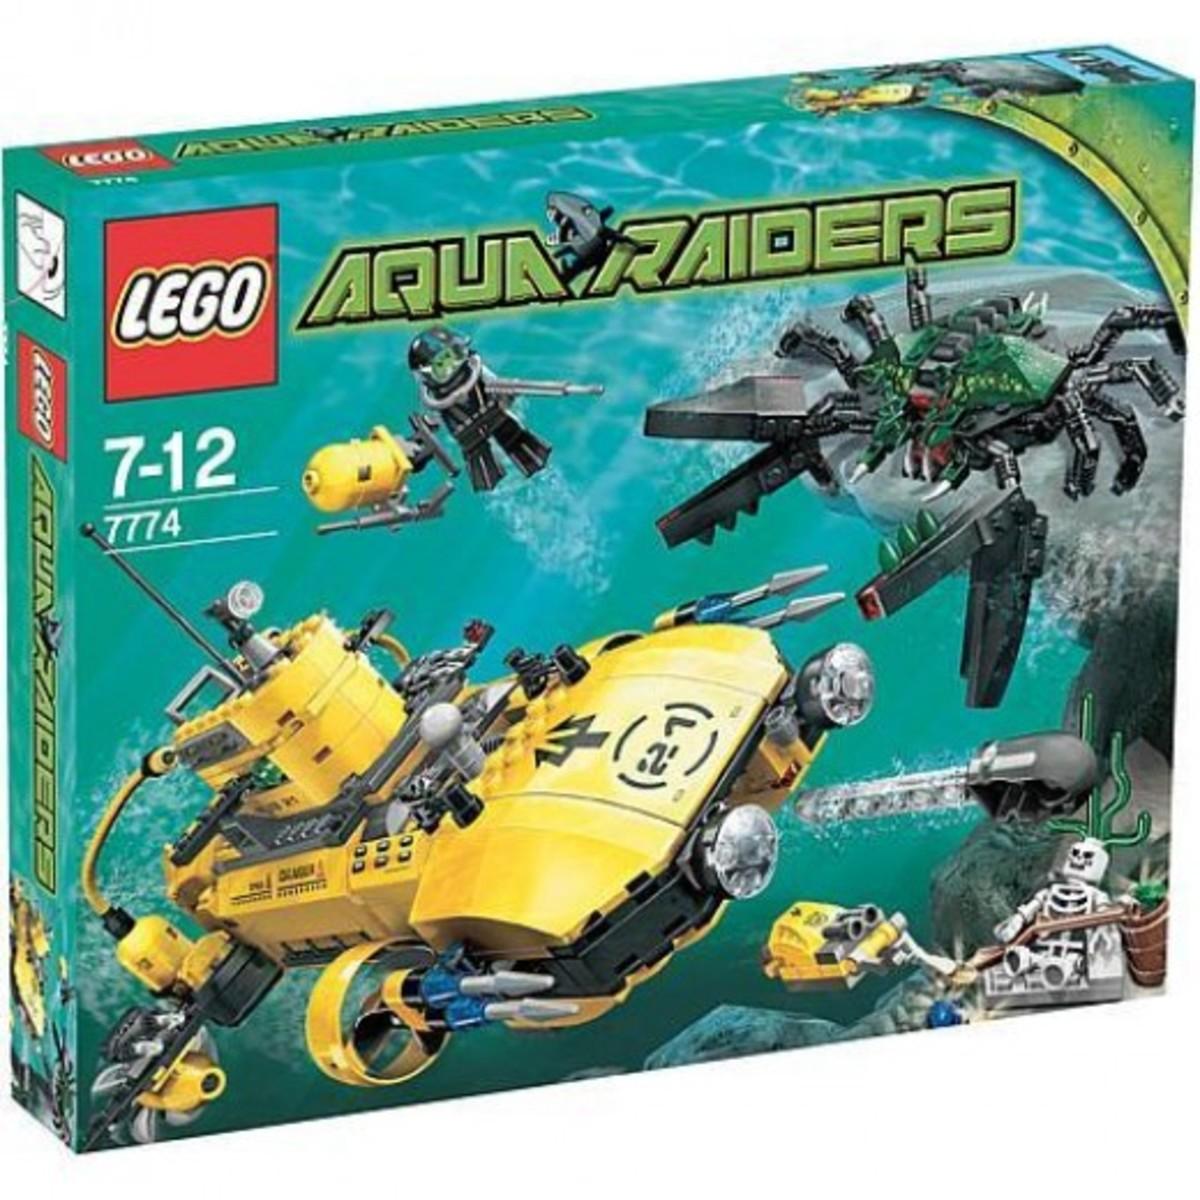 LEGO Aqua Raiders Crab Crusher 7774 Box